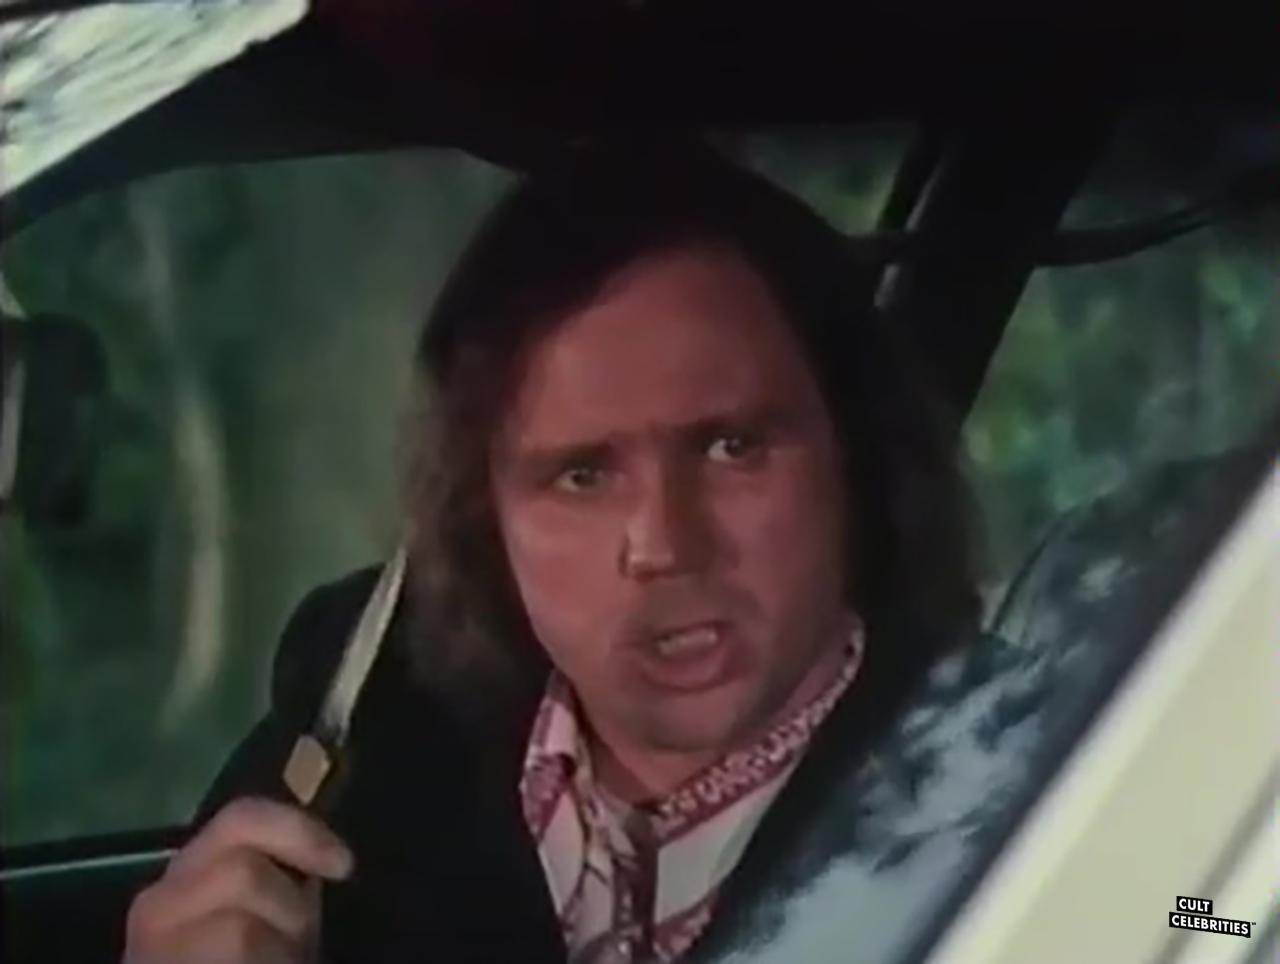 John King III as Wheeler in Psycho from Texas (1975)